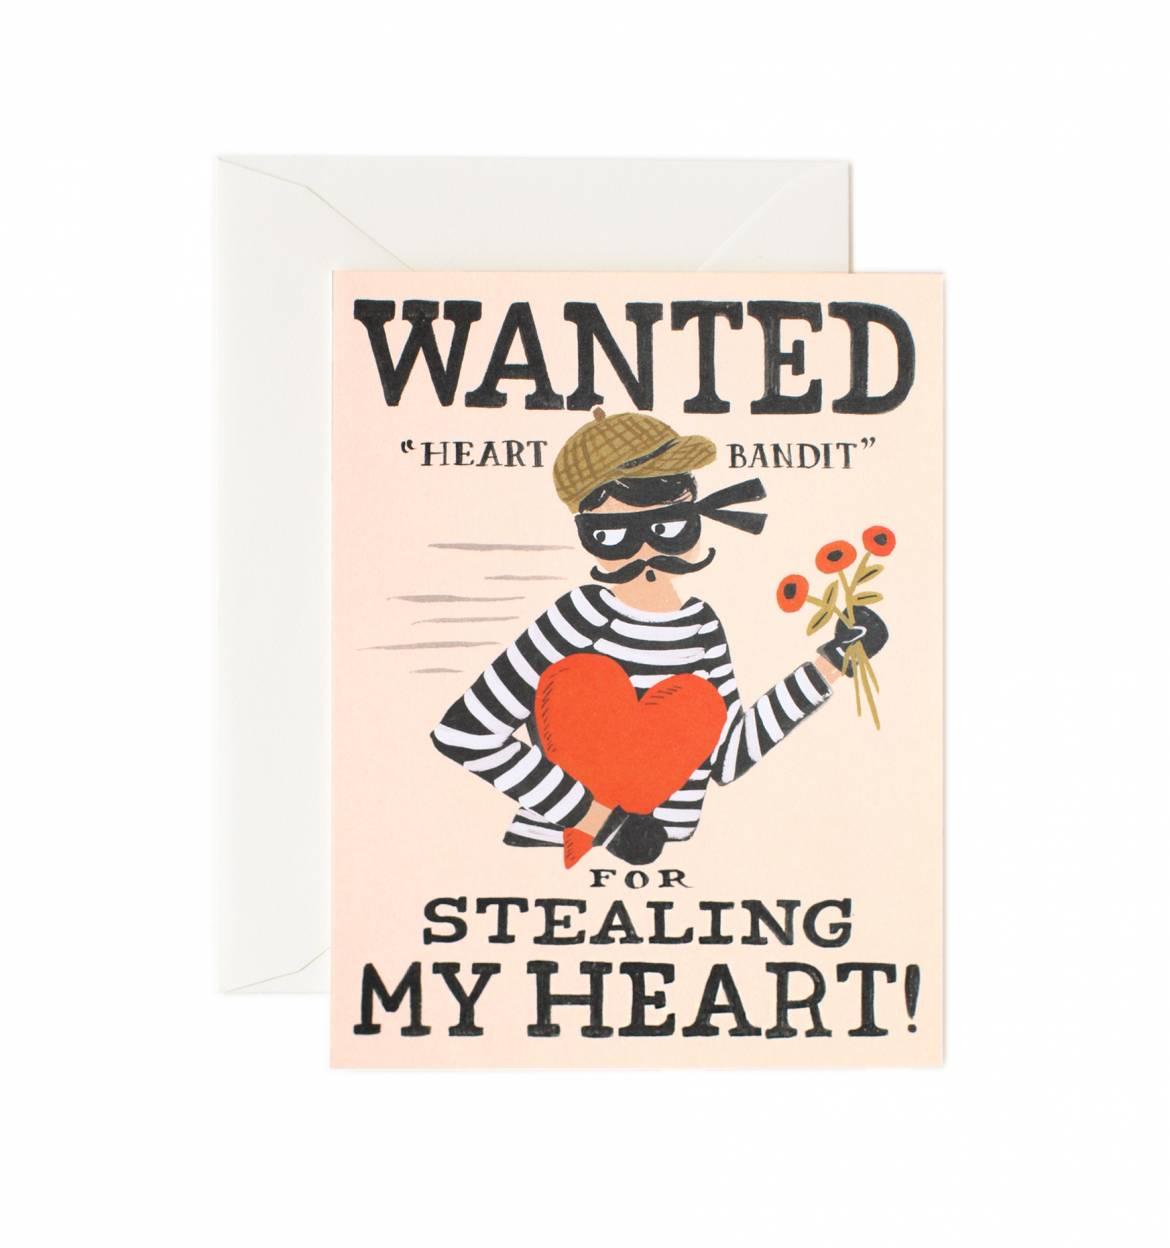 Heart Bandit